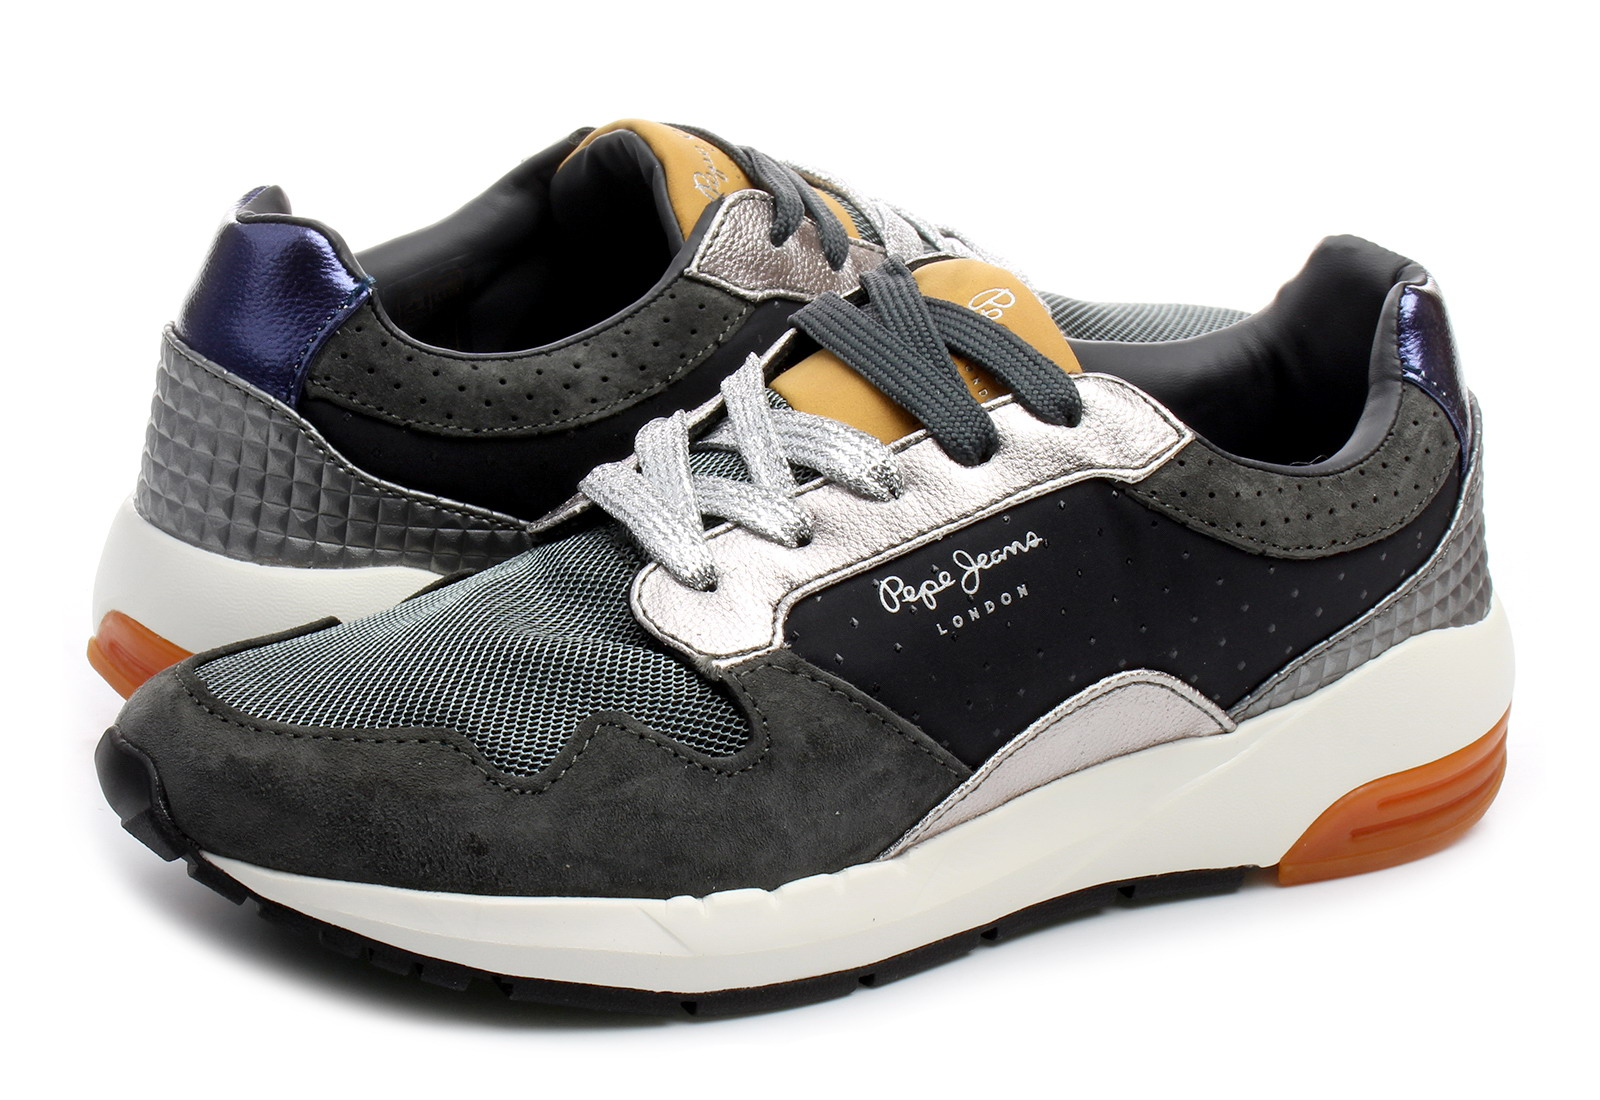 Pepe Jeans Cipő - Foster - PLS30680958 - Office Shoes Magyarország b3cab1de1d